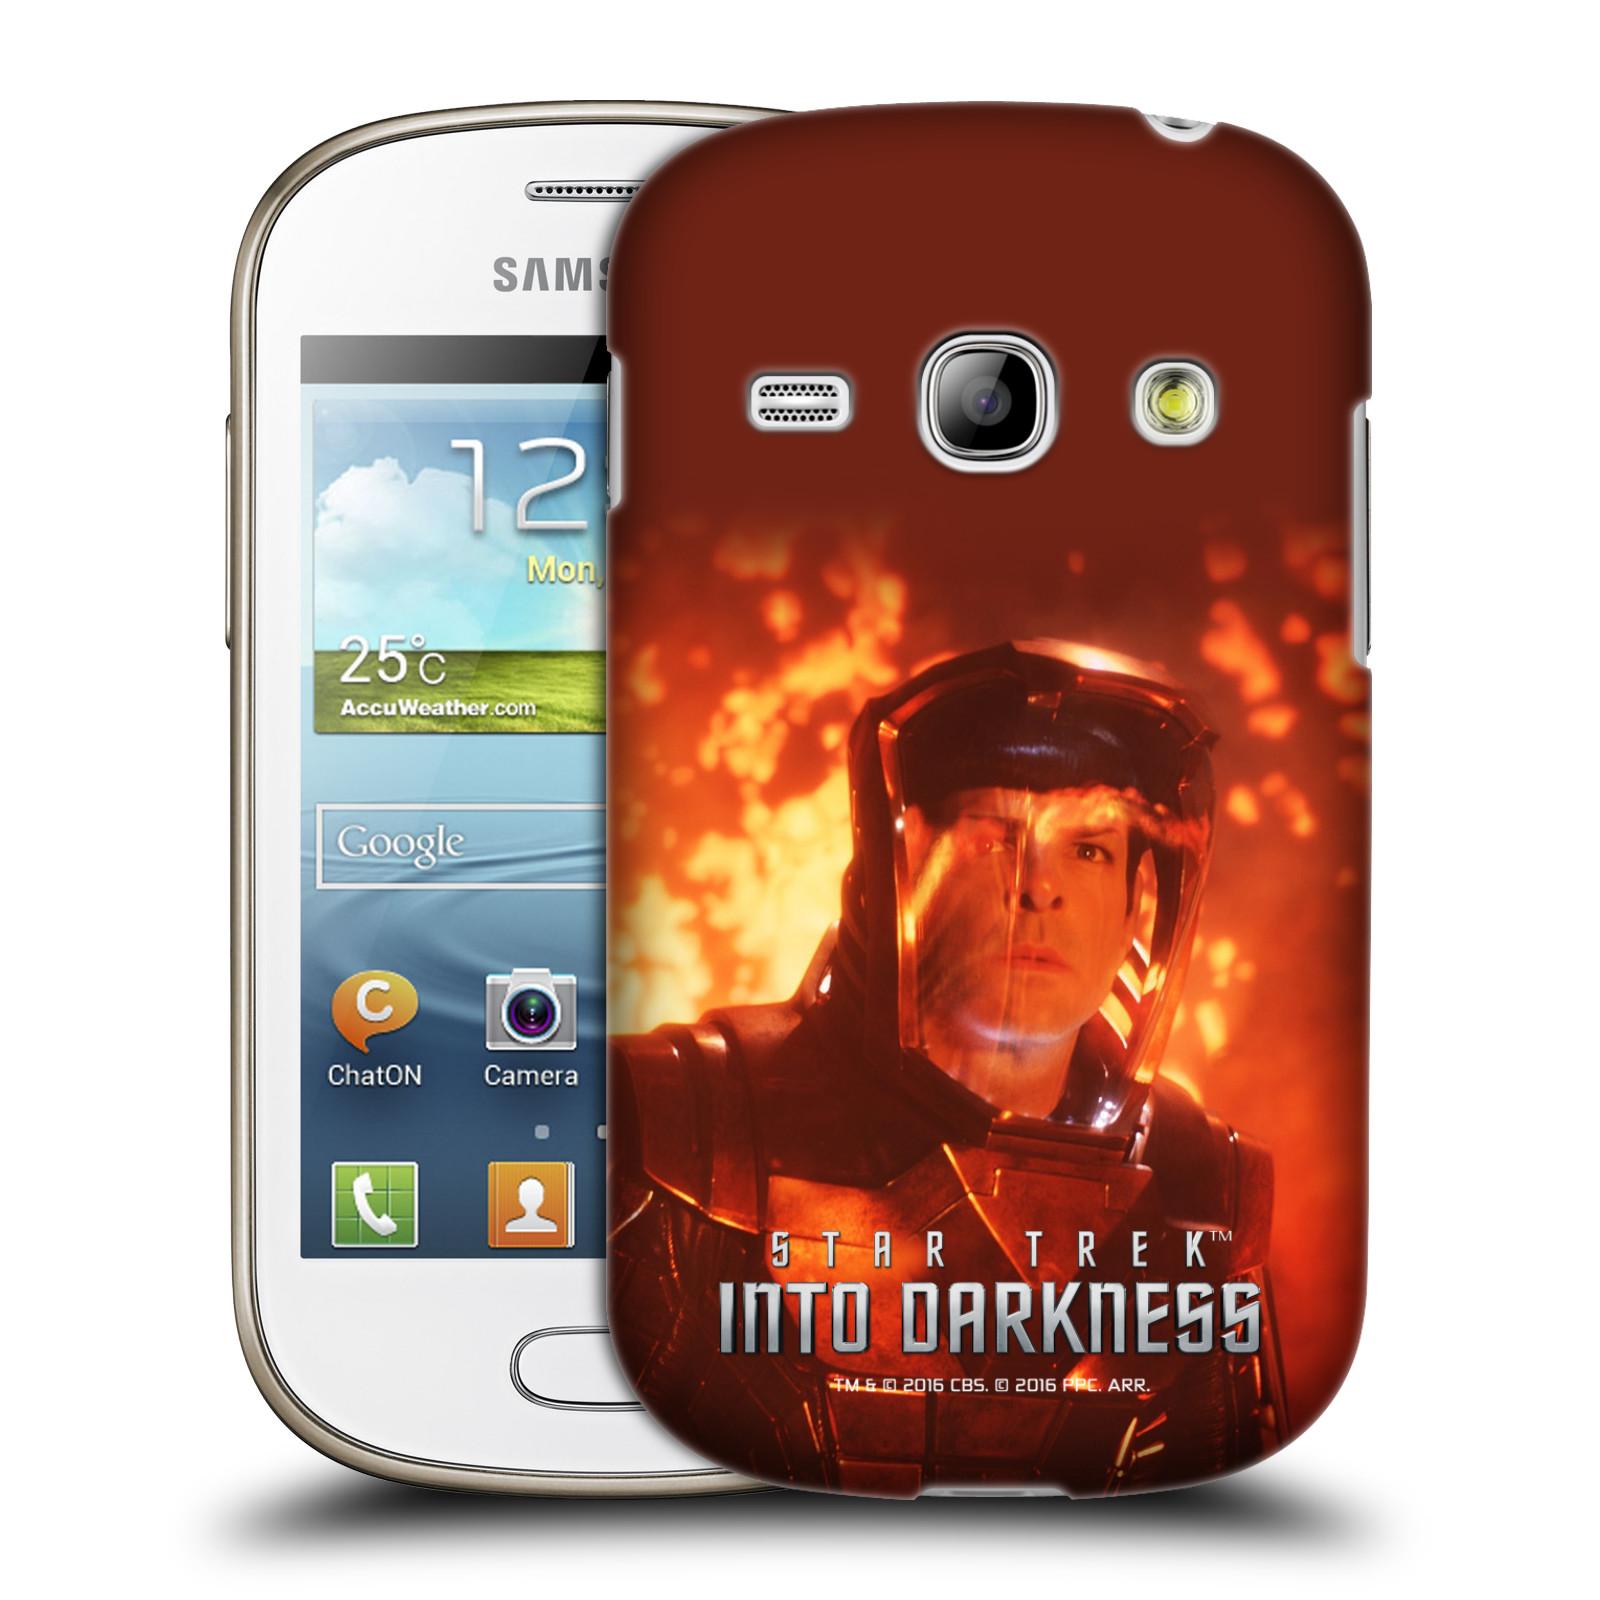 OFFICIAL STAR TREK MOVIE STILLS INTO DARKNESS XII HARD BACK CASE FOR SAMSUNG PHONES 5